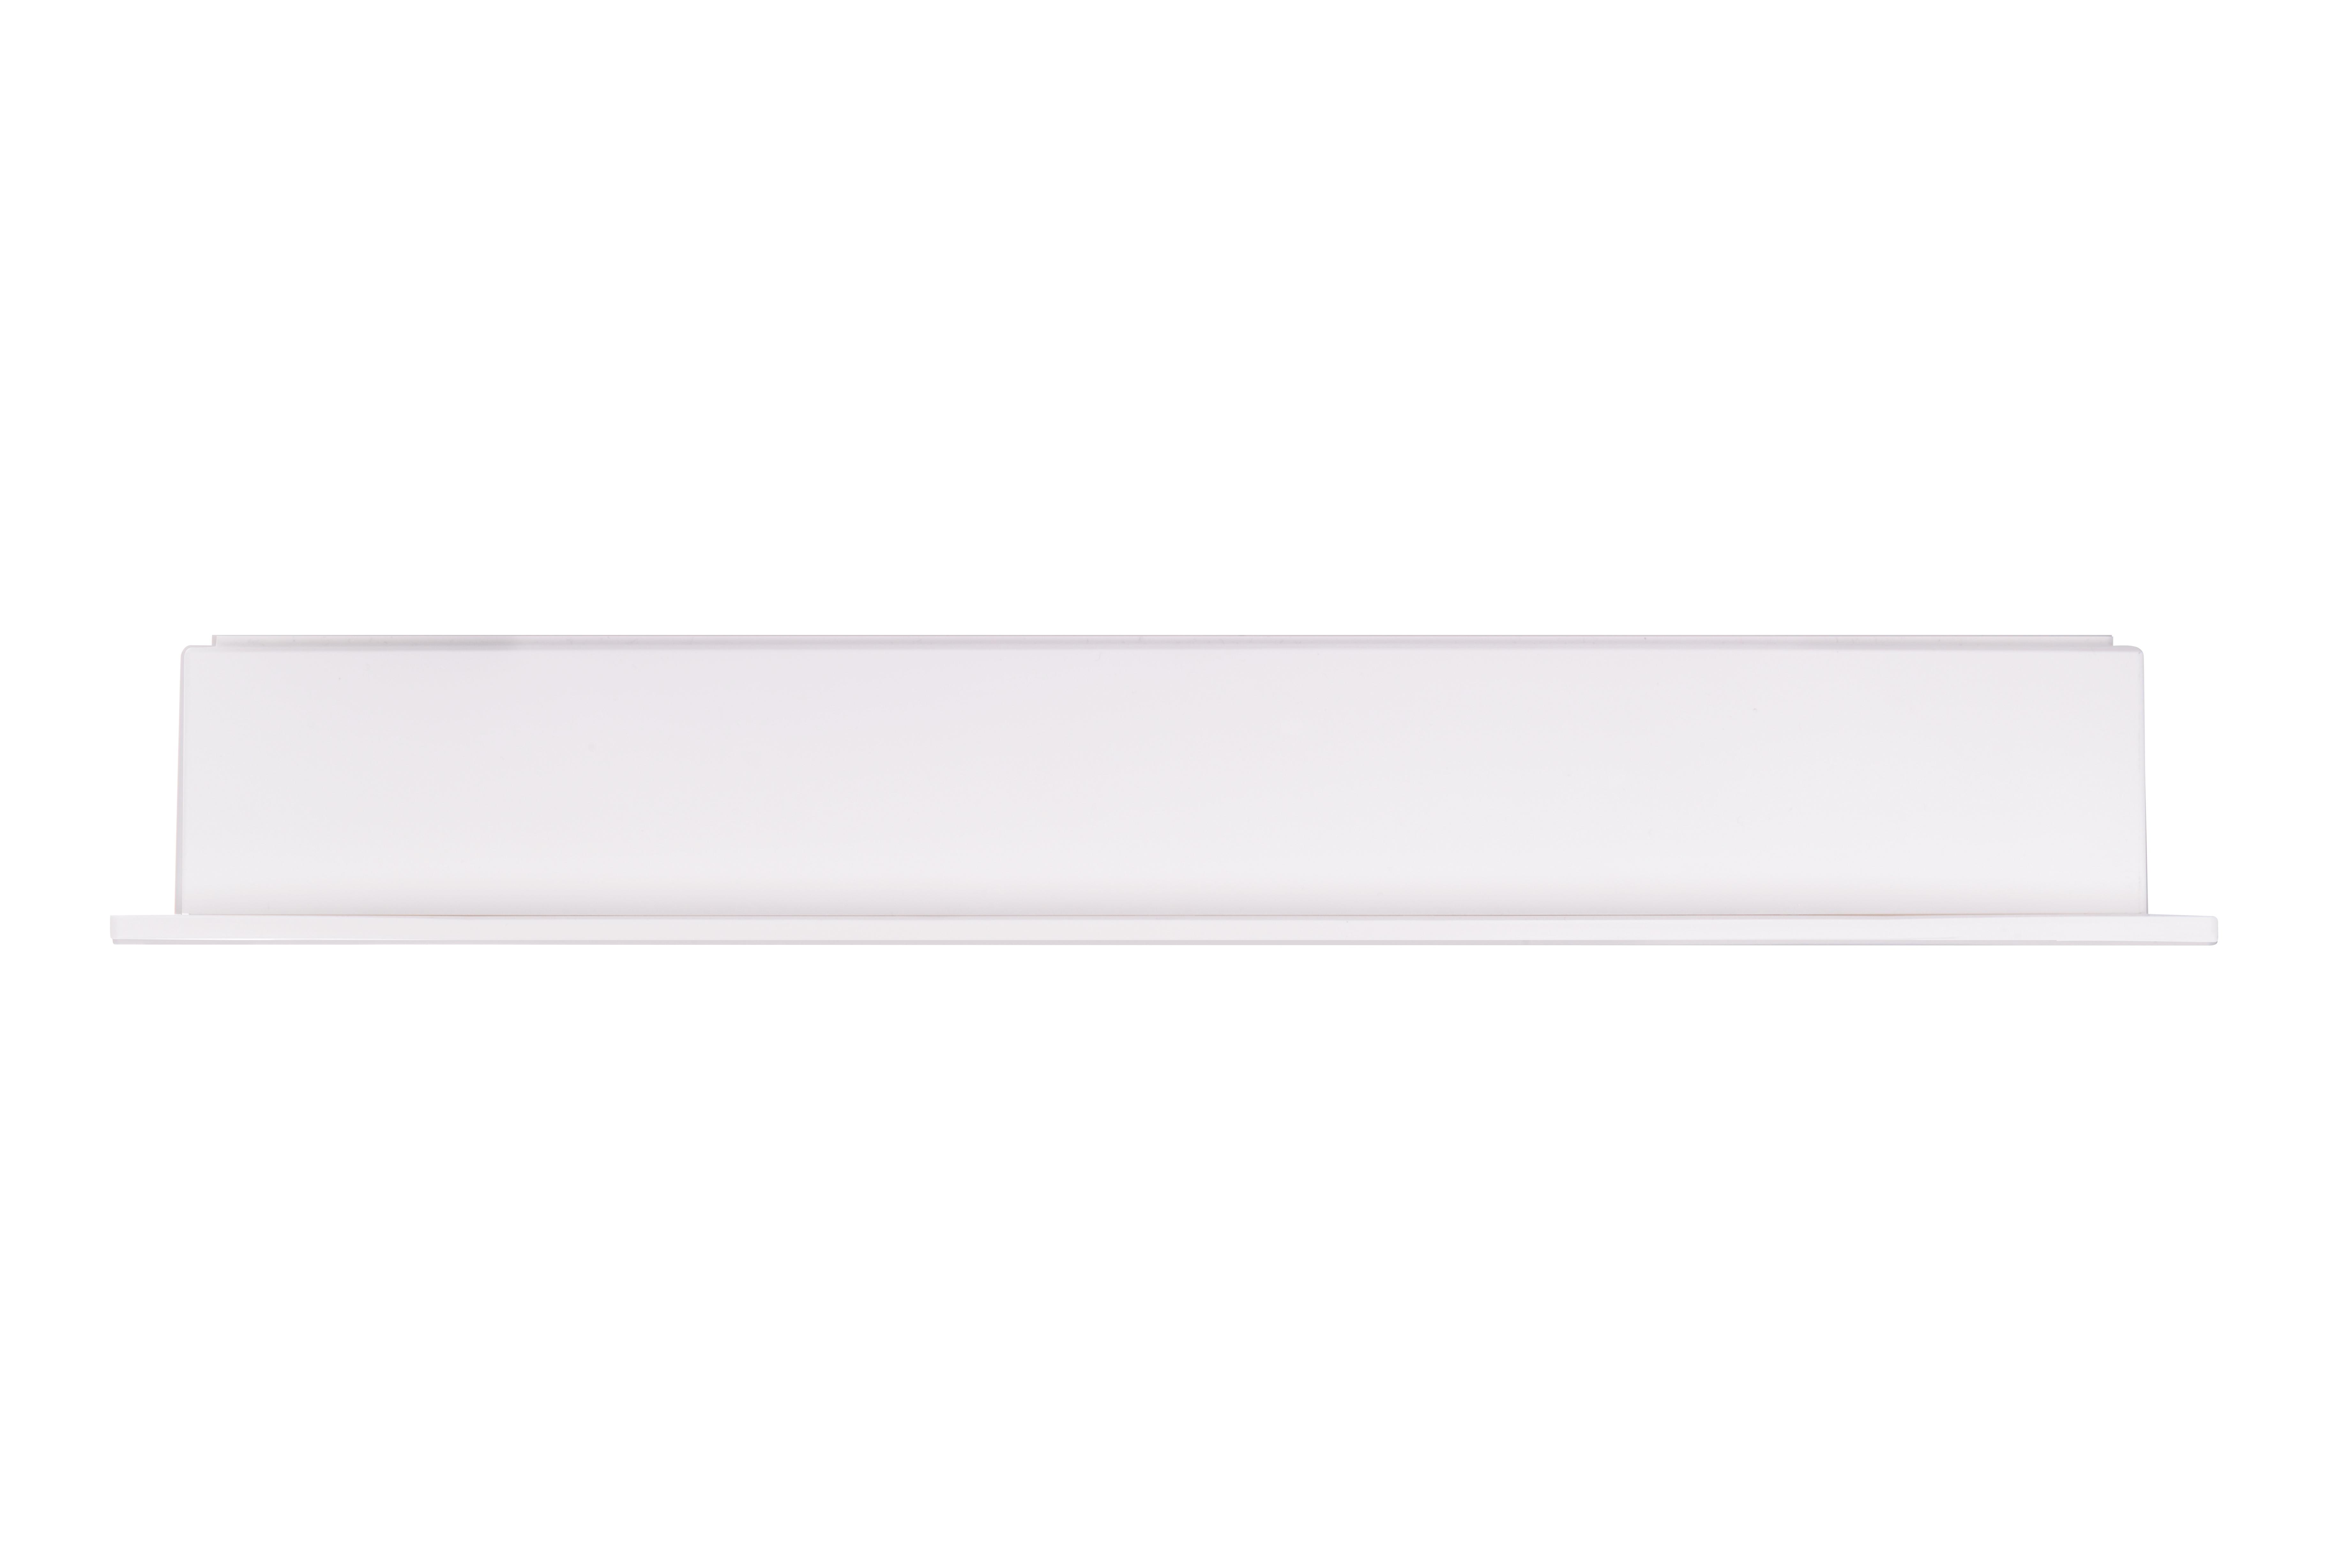 Lampa emergenta led Intelight 94523   3h nementinut test automat5